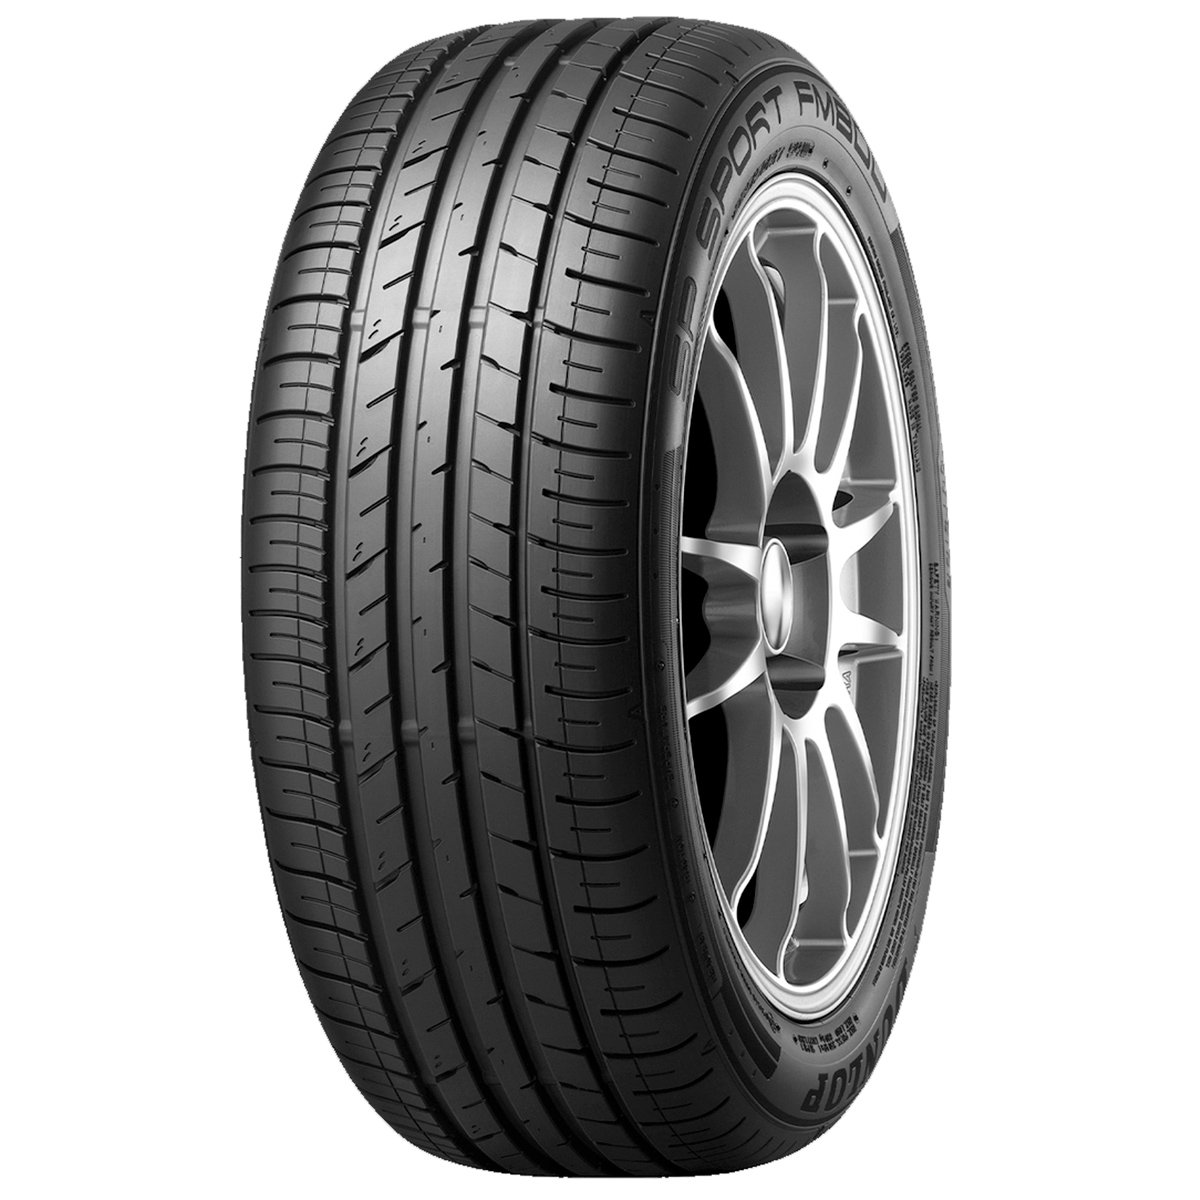 Pneu Dunlop 225/50R17 94W SPFM800 DEV